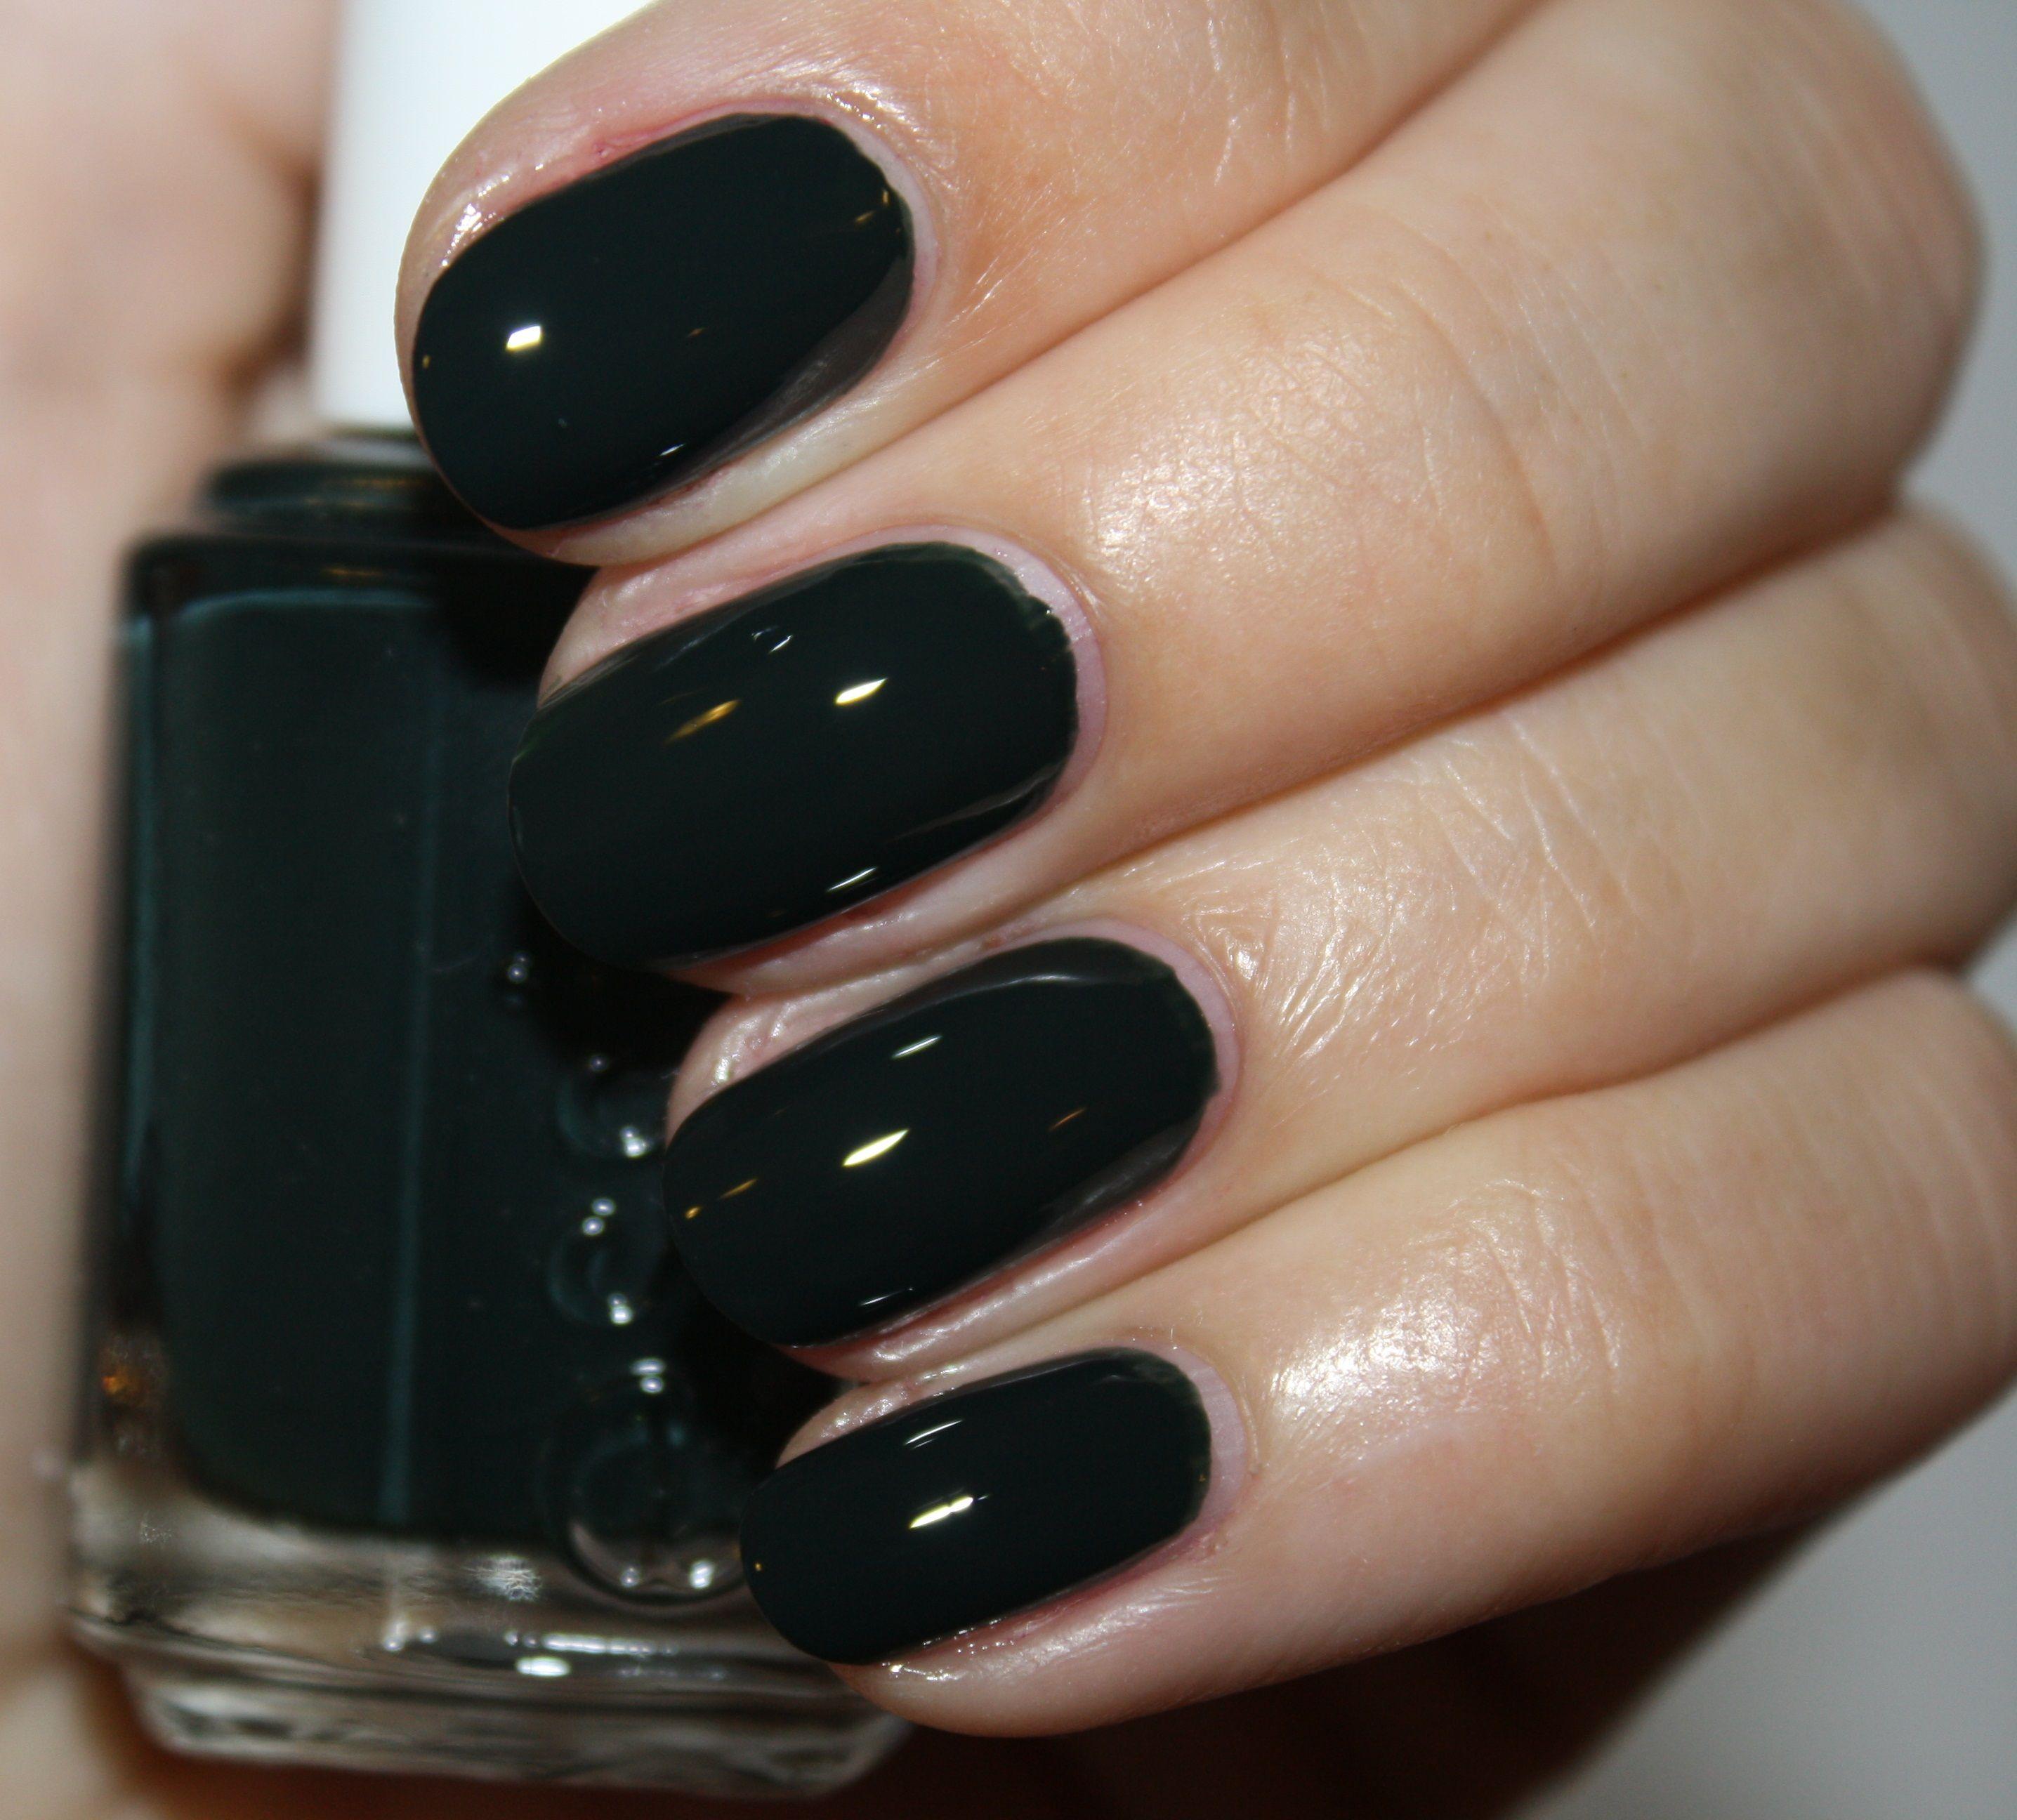 ESSIE - Stylenomics | Nails | Pinterest | Esmalte y Belleza